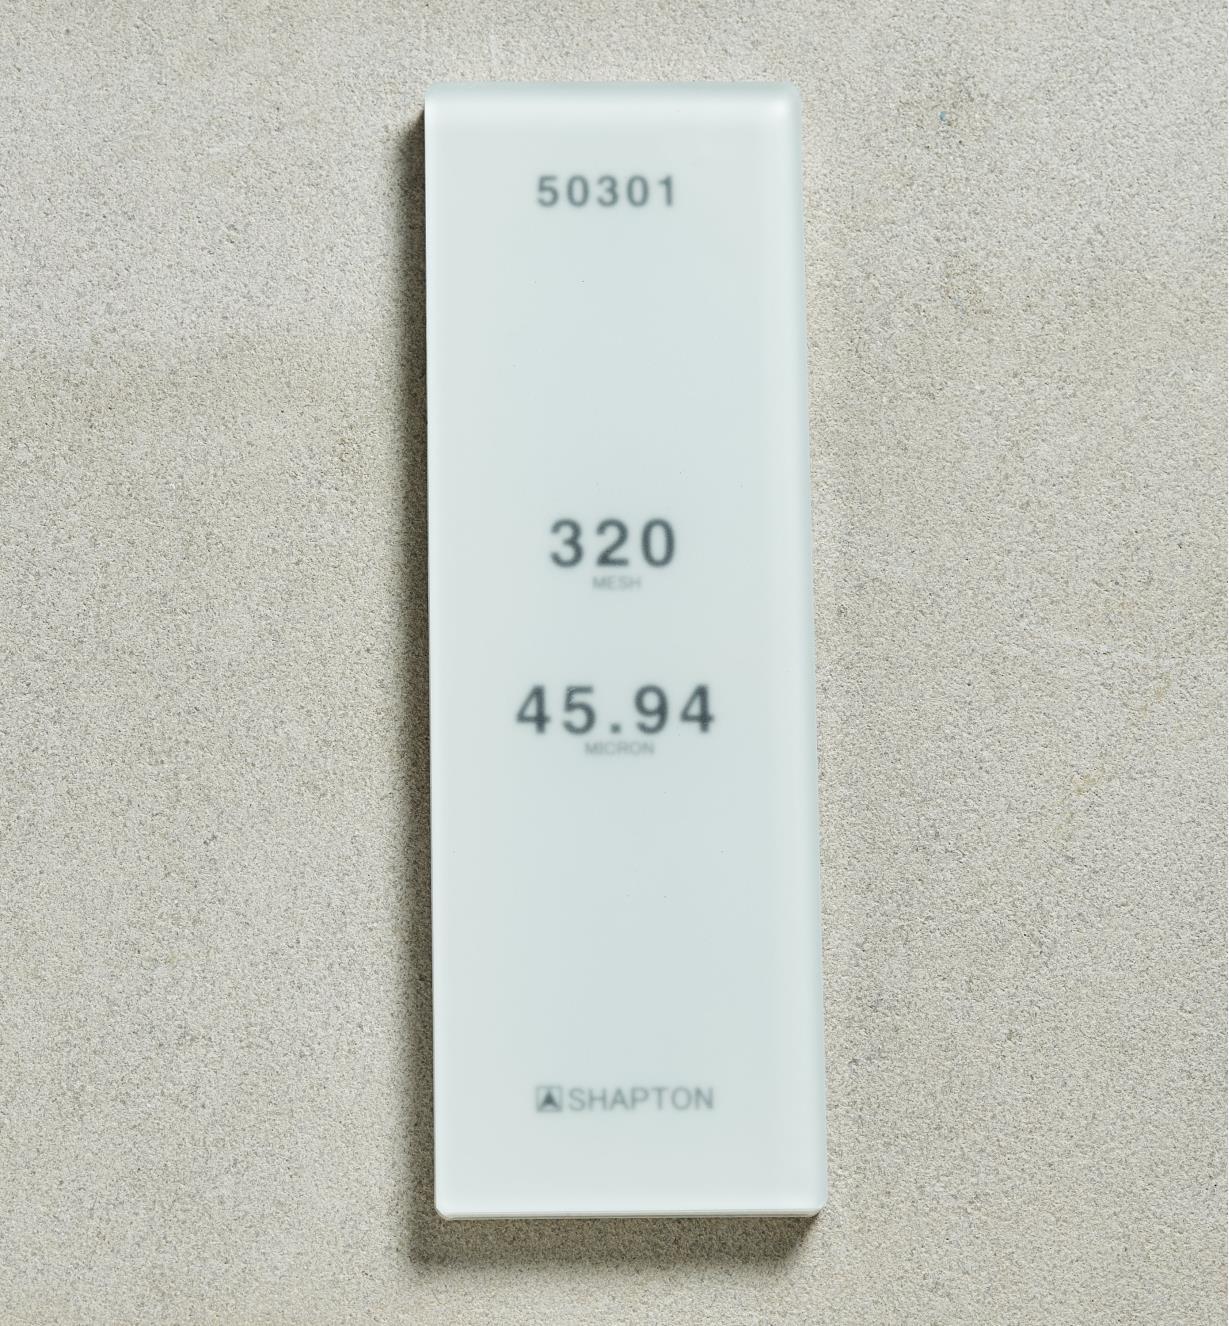 61M0303 - Shapton GlassStone HR Stone 4594µ 320x